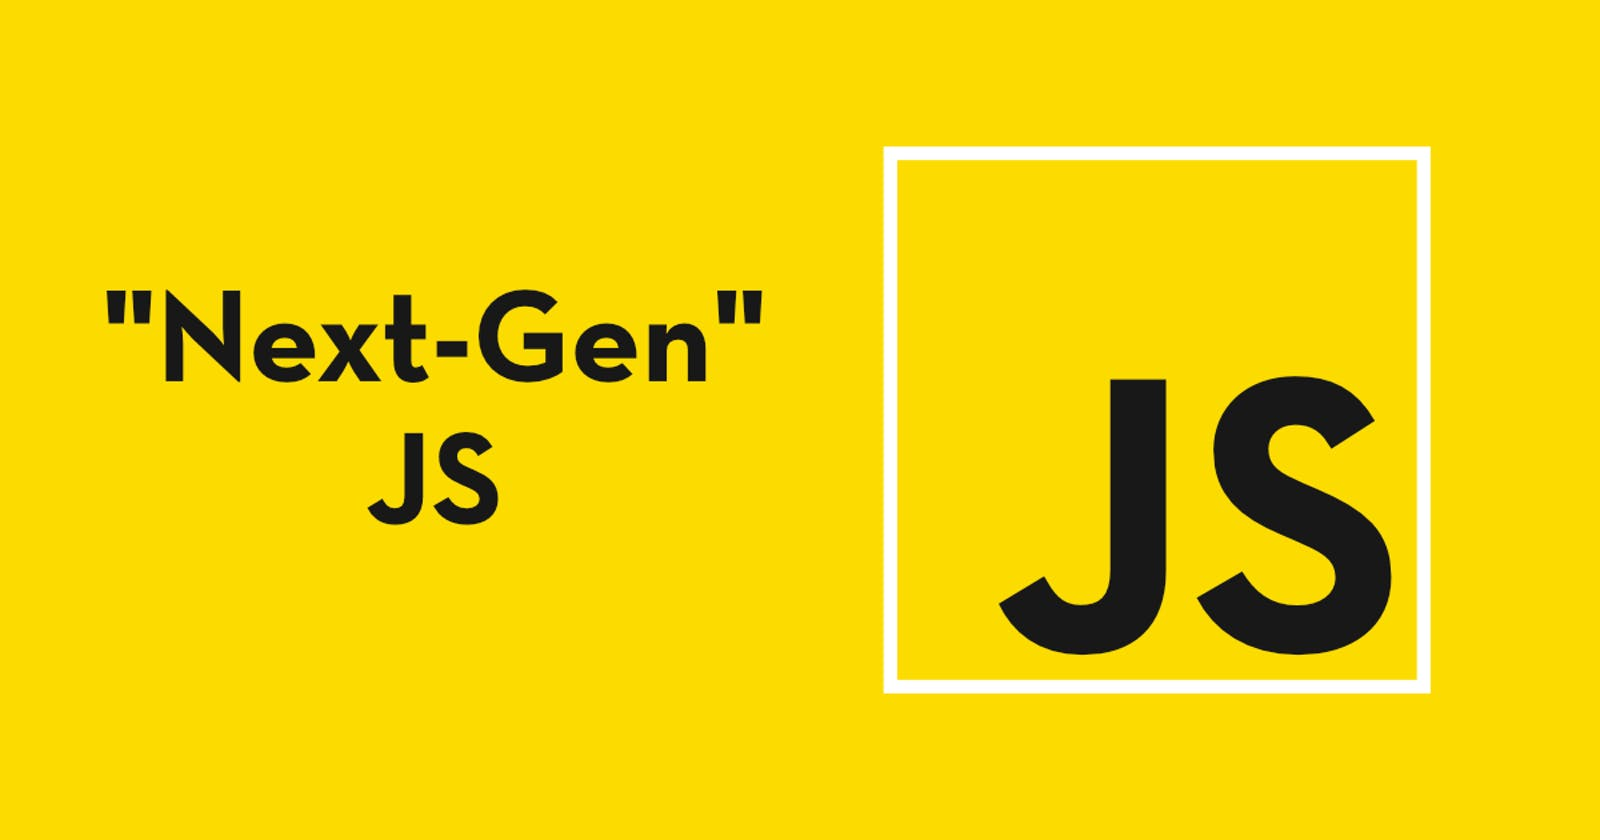 Get started with Next-Gen JavaScript